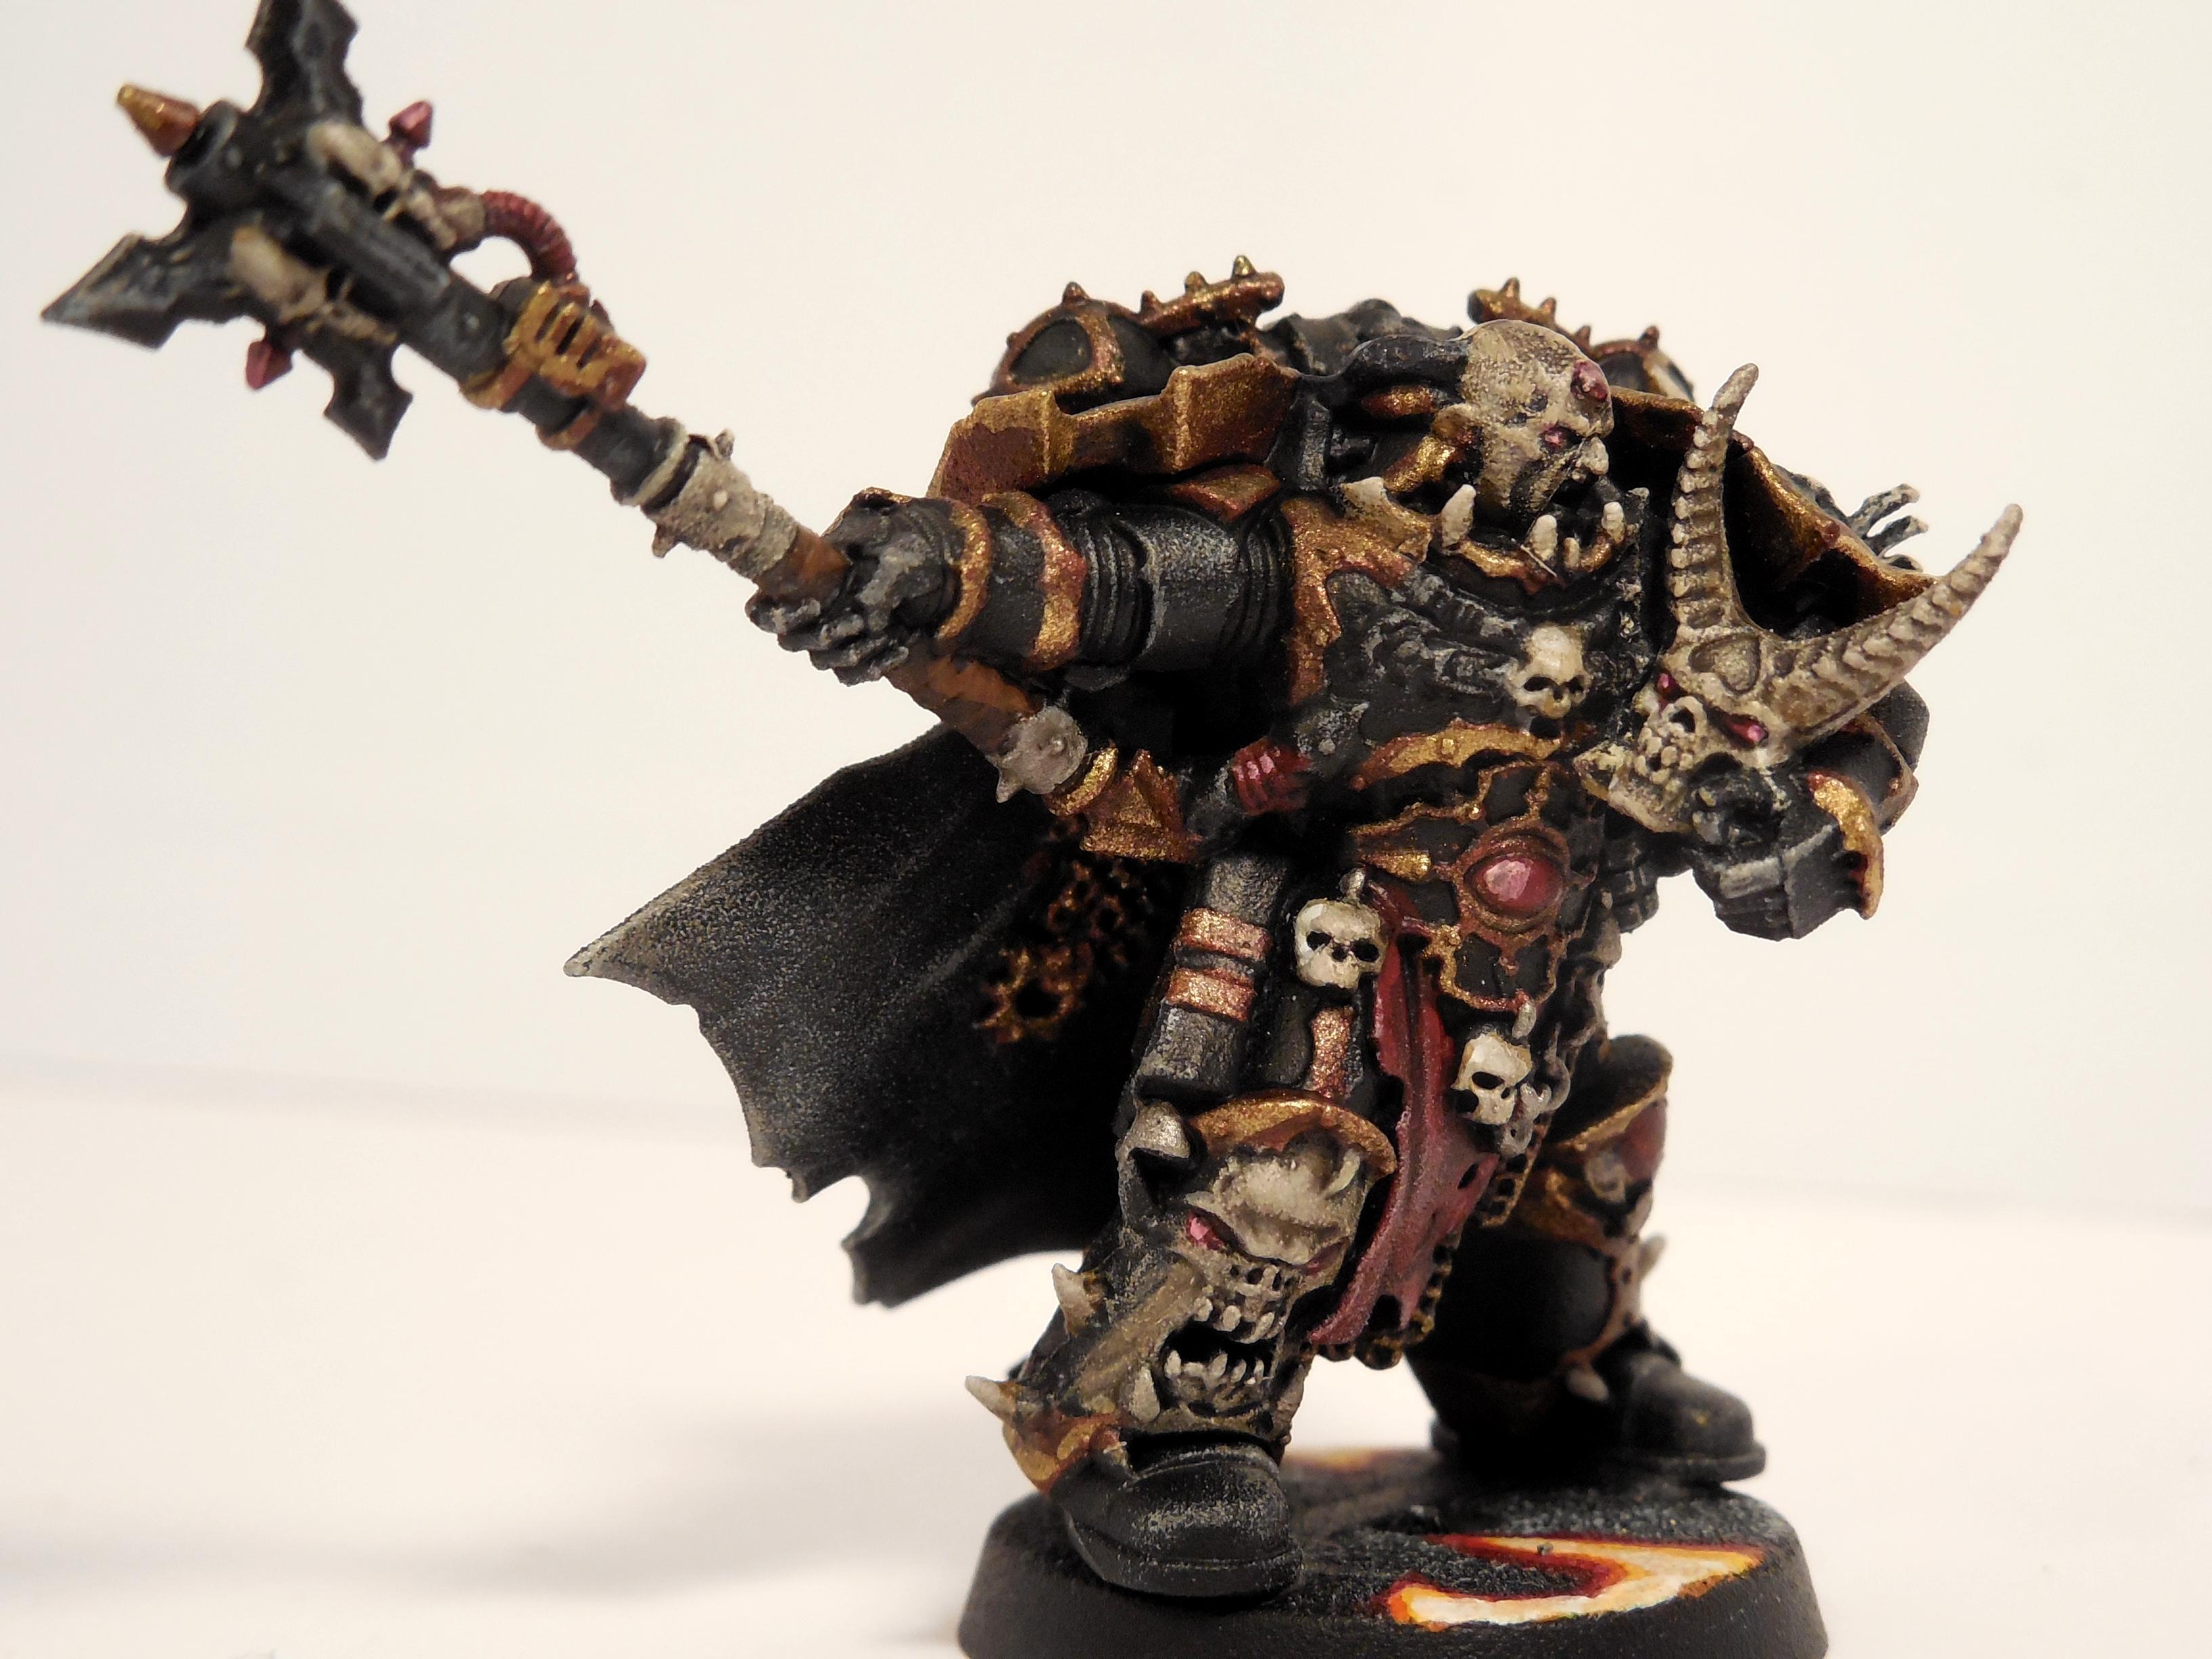 Black Legion, Chaos, Chaos Dark Vengence, Chaos Hellbrute, Chaos Space Marines, Cultists, Warhammer 40,000